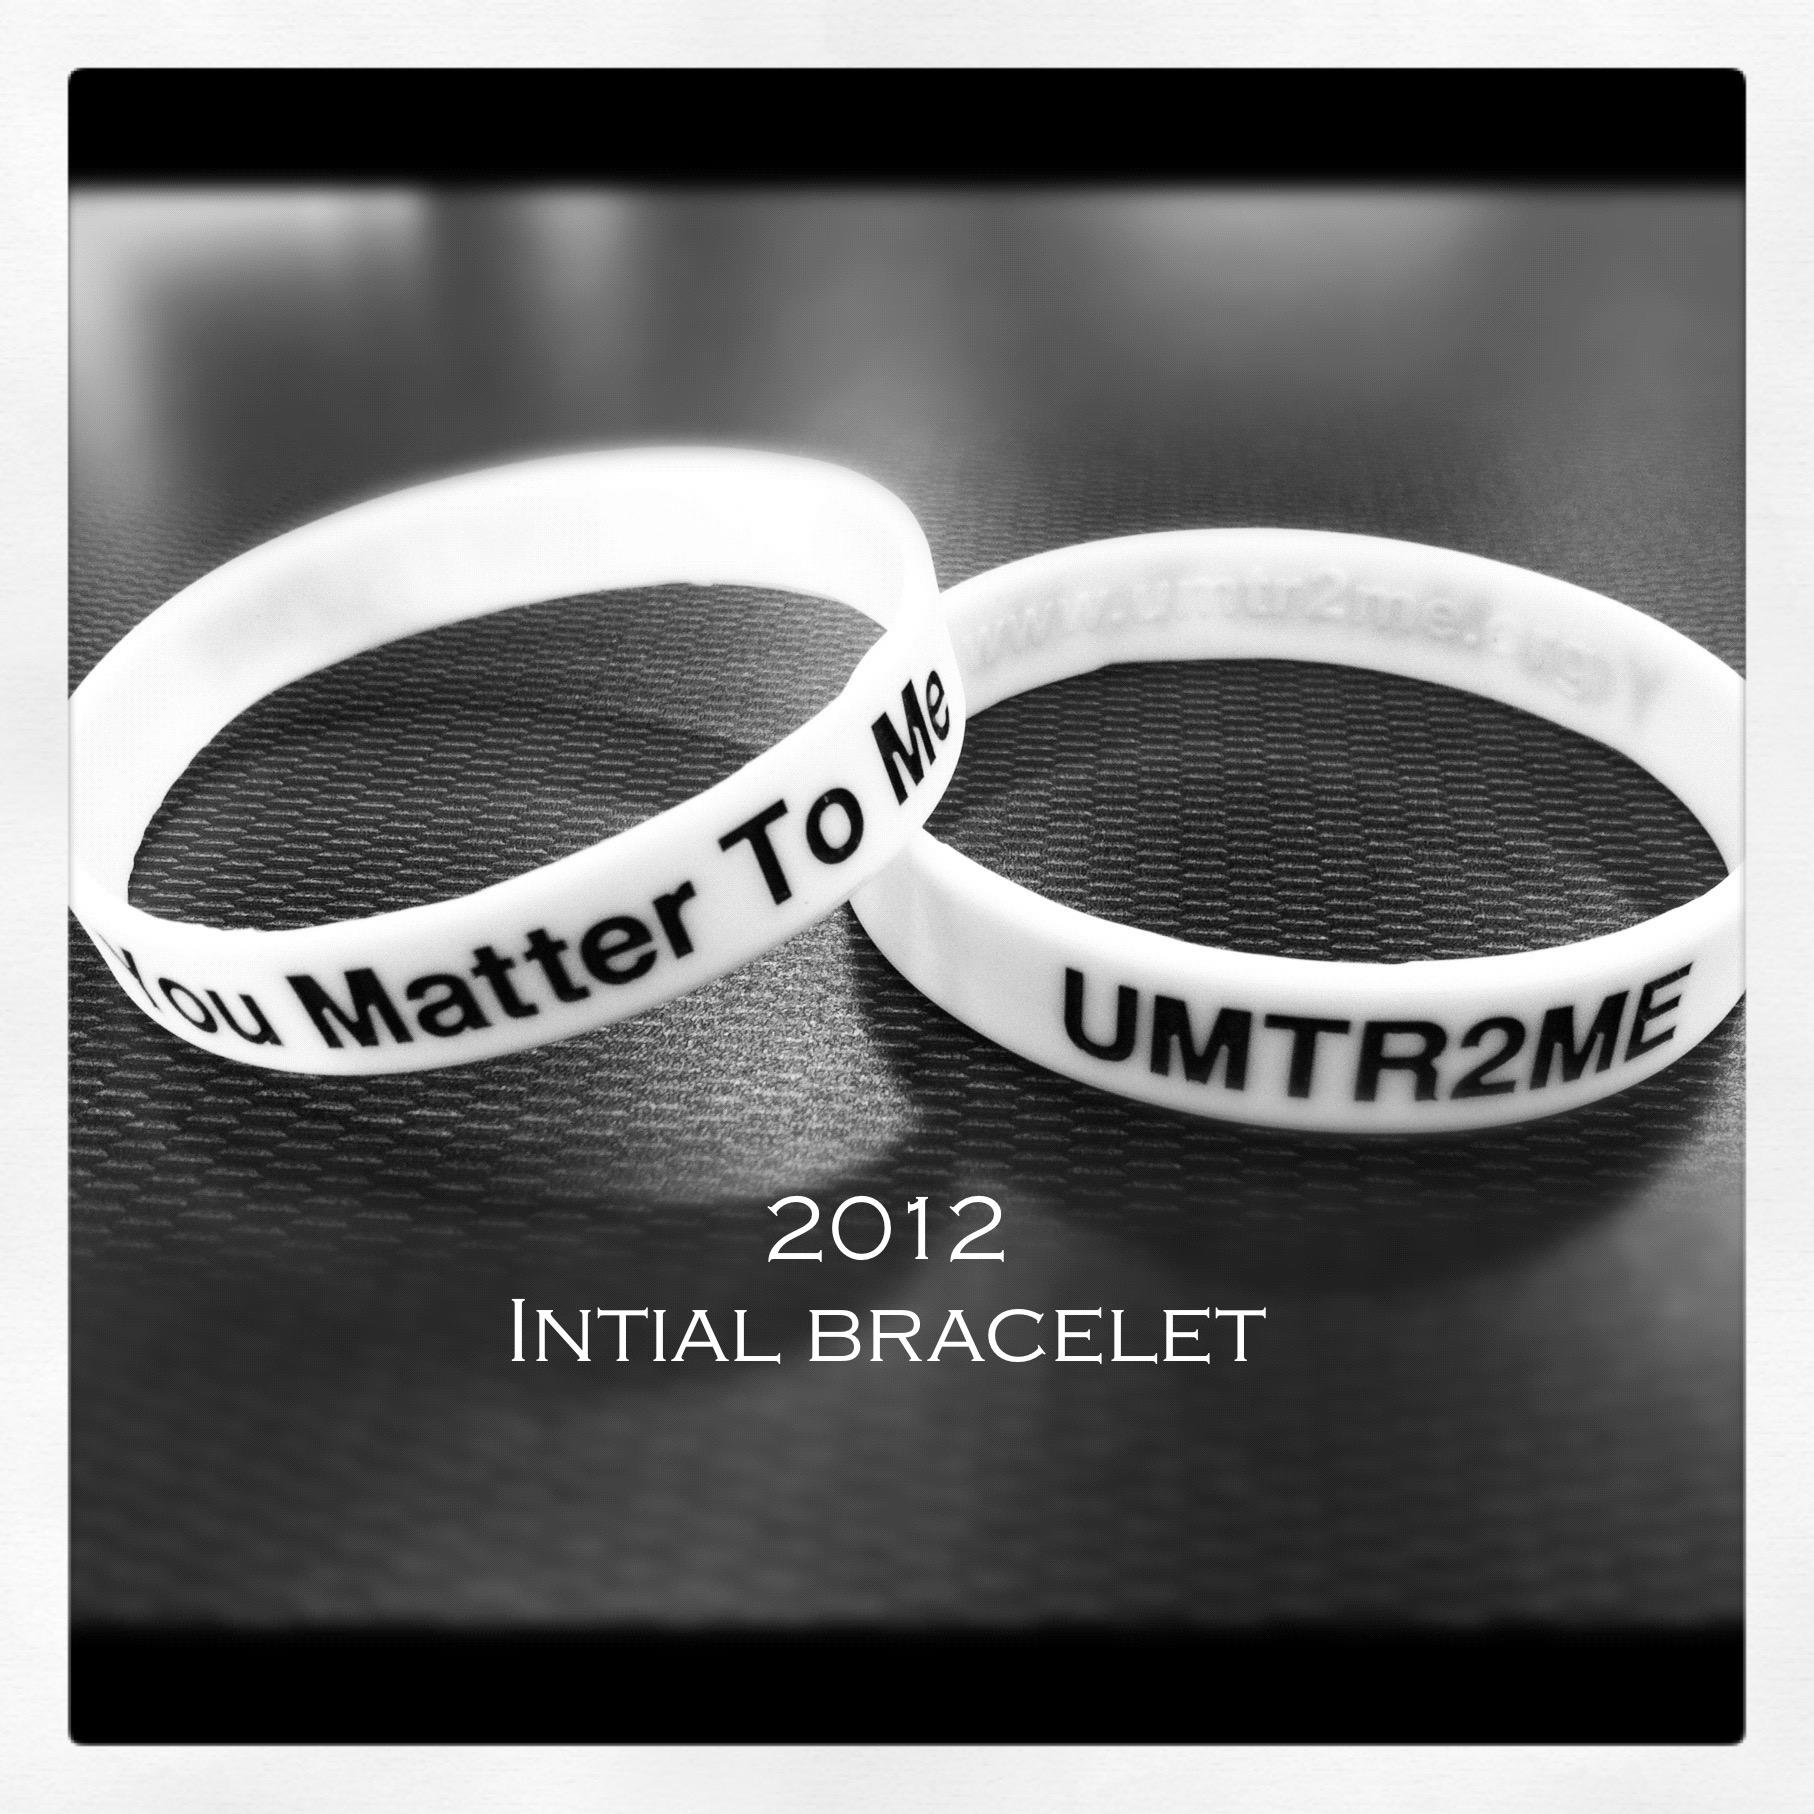 ff15 how to get dark matter bracelet